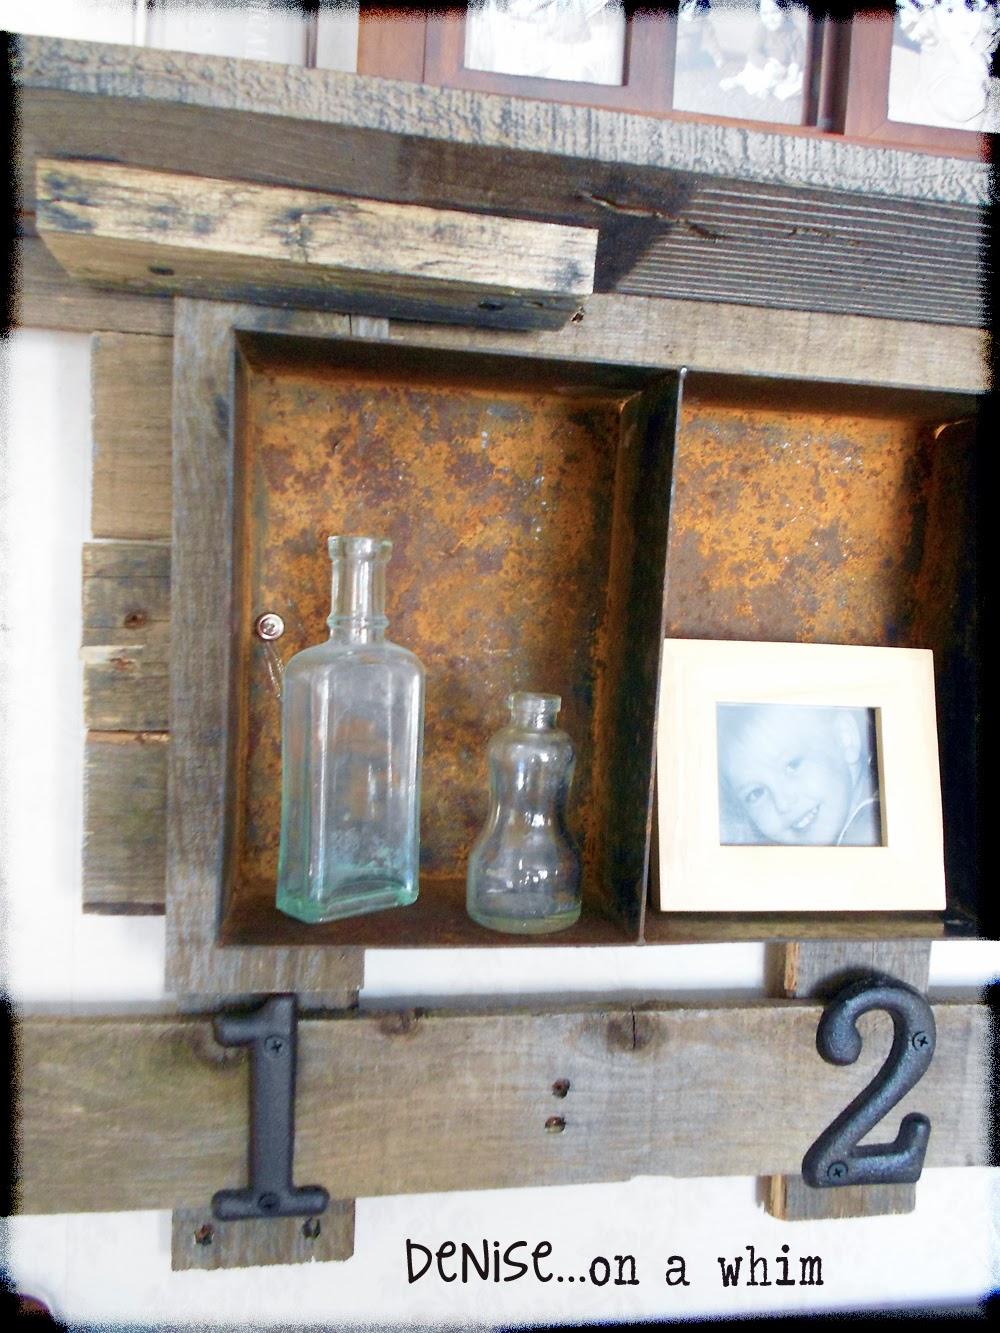 A rusty bin turned shelf for displaying small items via http://deniseonawhim.blogspot.com